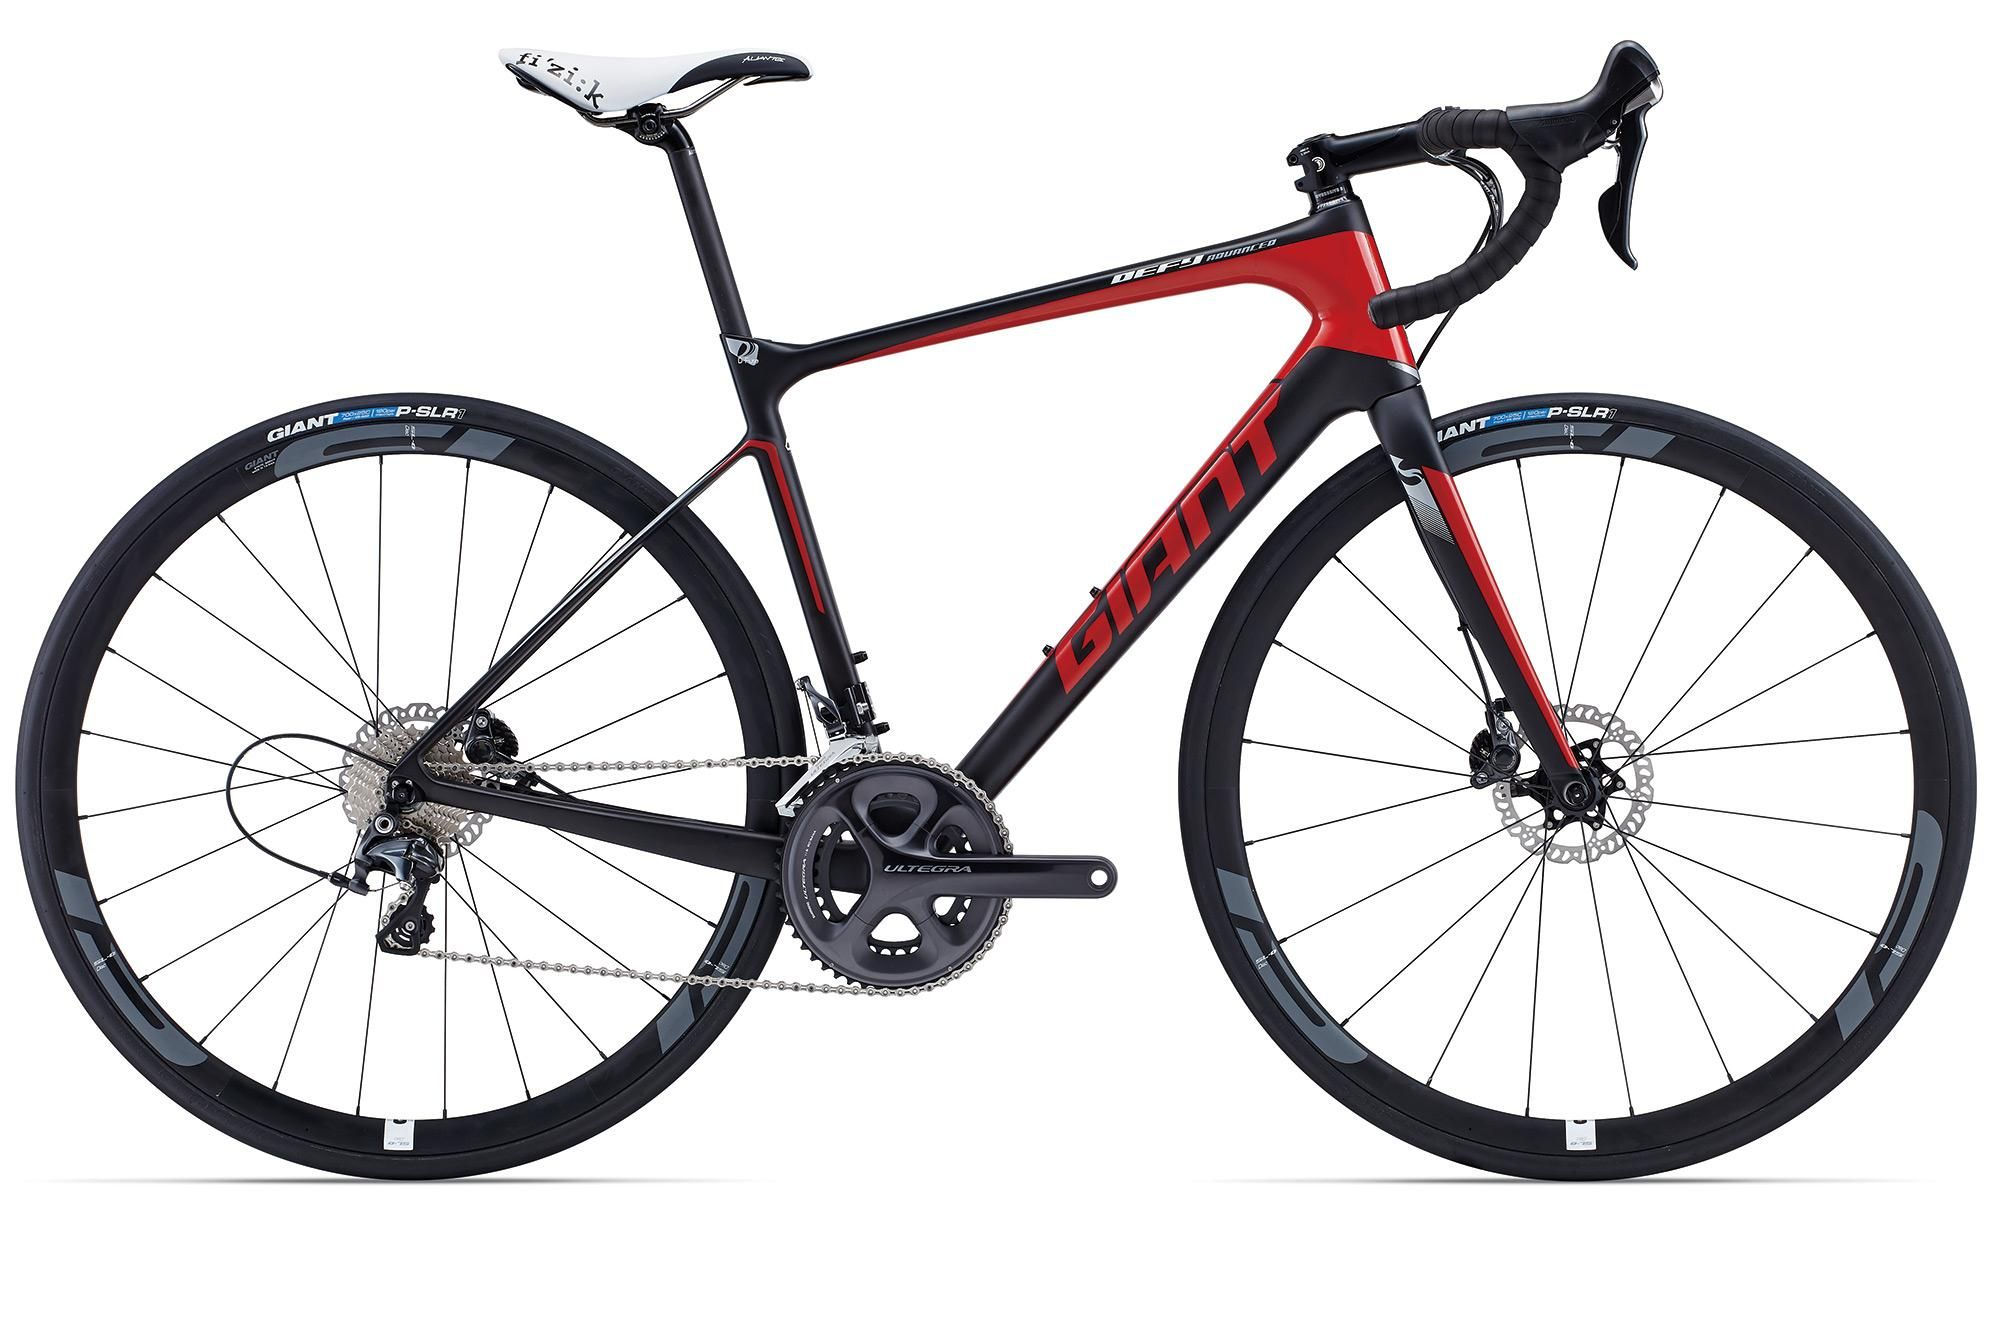 Defy Advanced Pro 1 2015 Giant Bicycles Australia Giant Defy